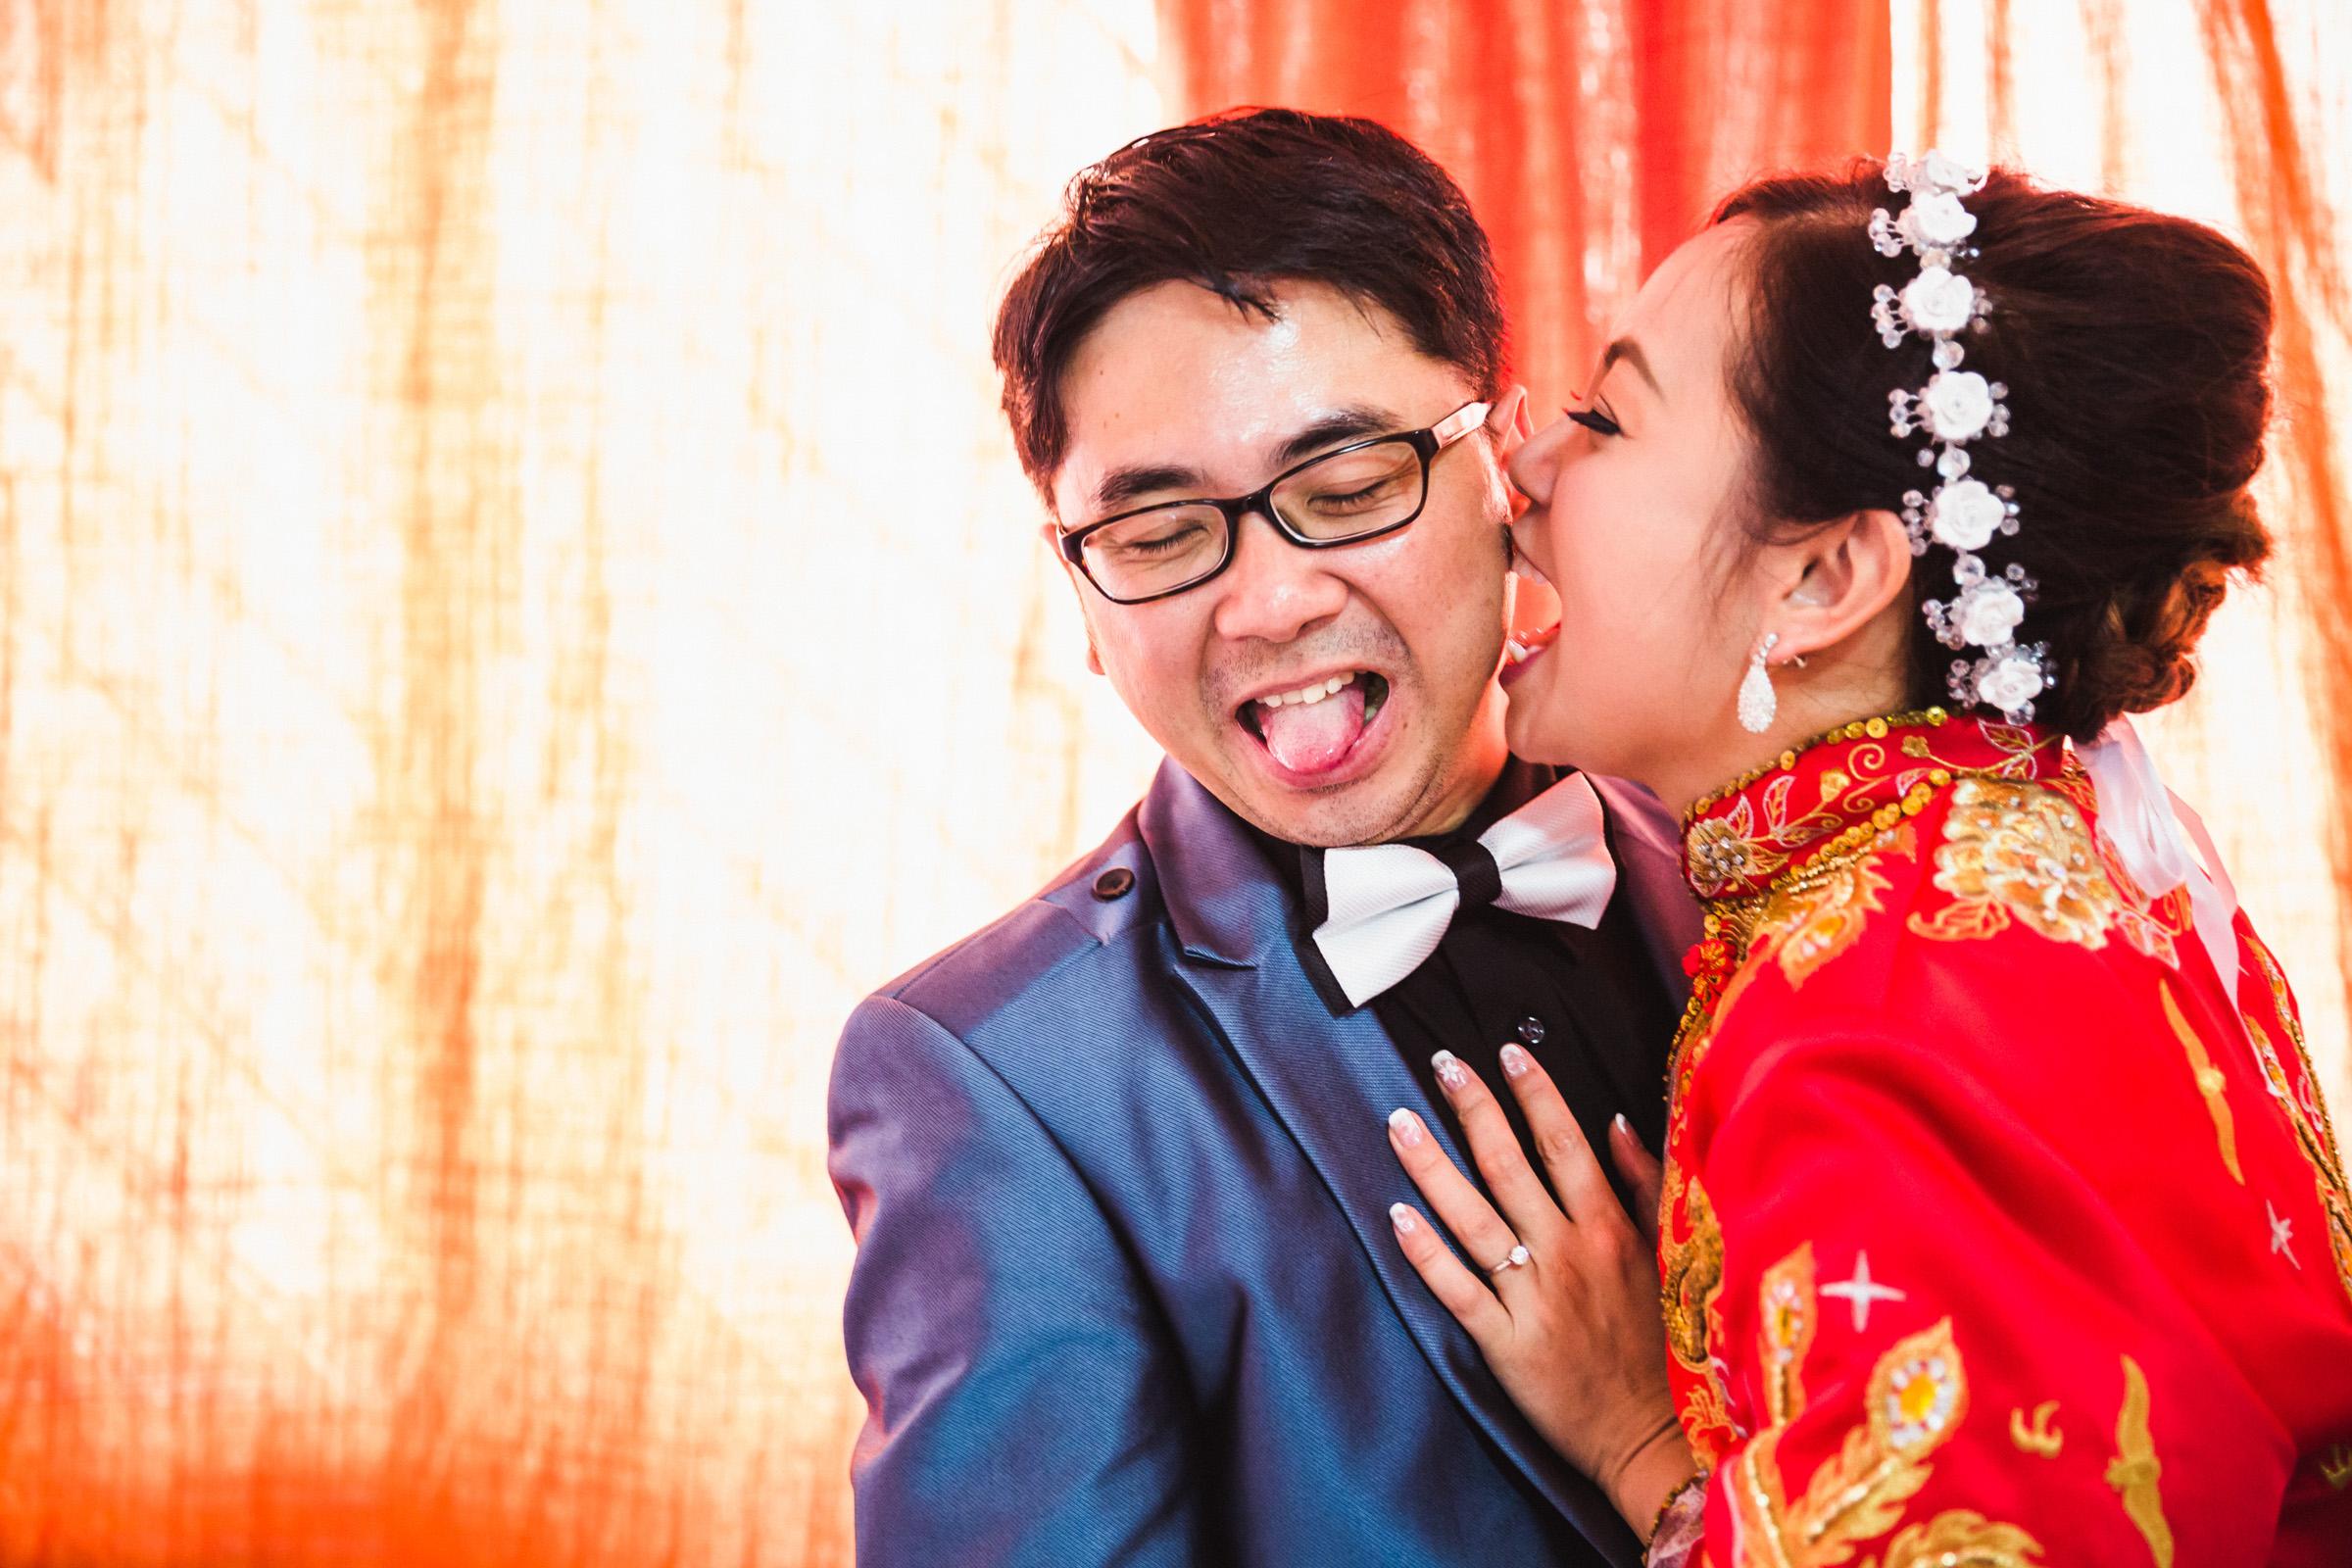 Steven_Jasmine_Wedding_Walldrobe Photography_Wedding shoots_Actual day wedding_Photographer (26)